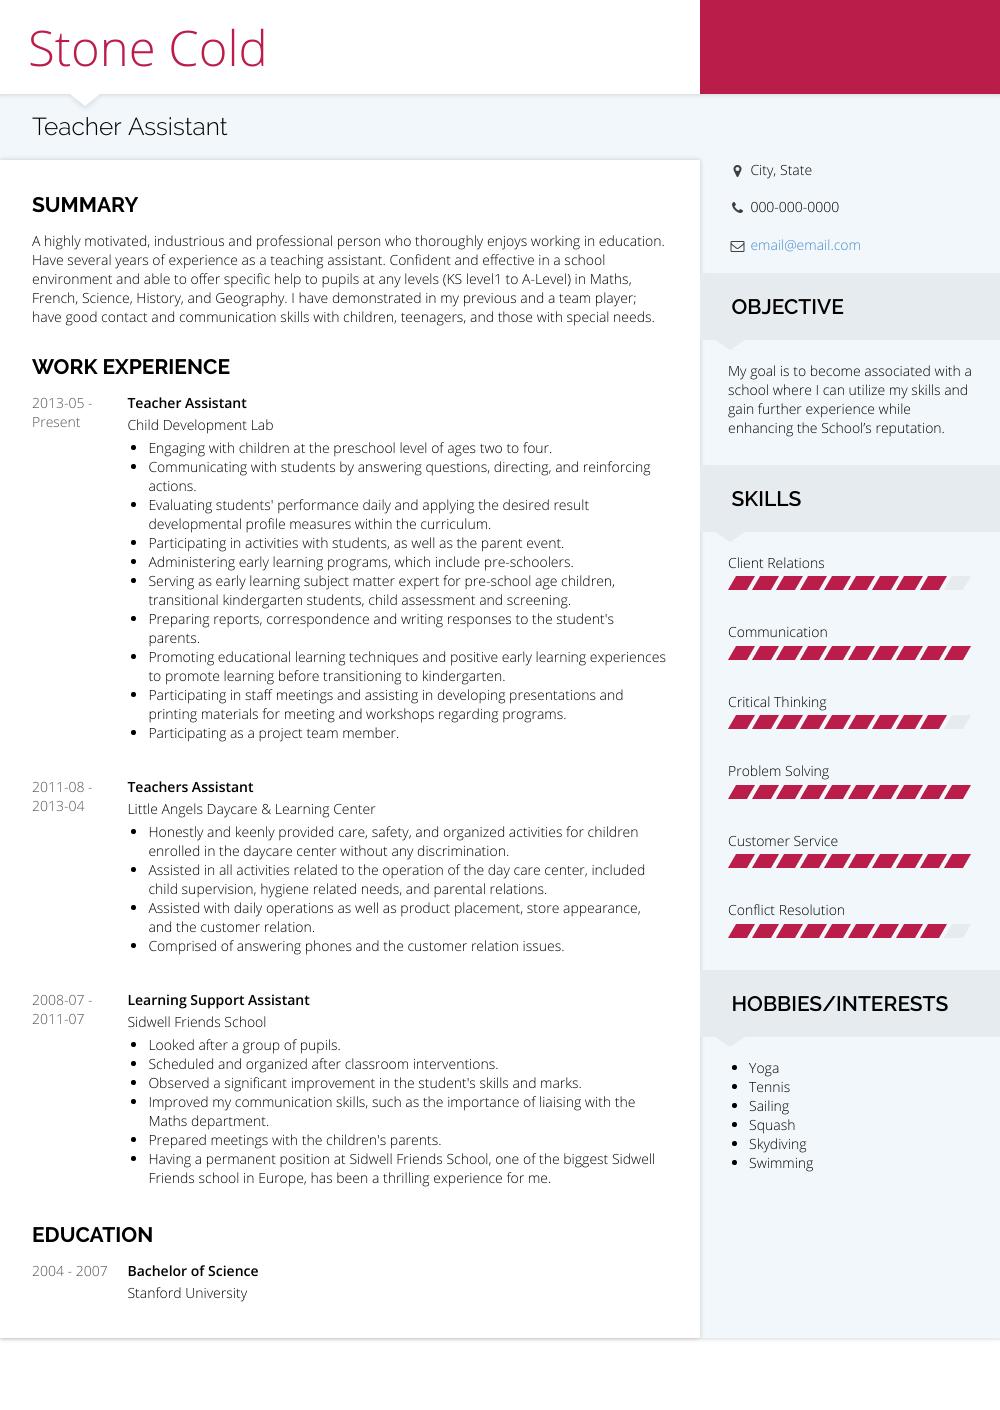 Teacher Assistant  Resume Samples  Templates  VisualCV